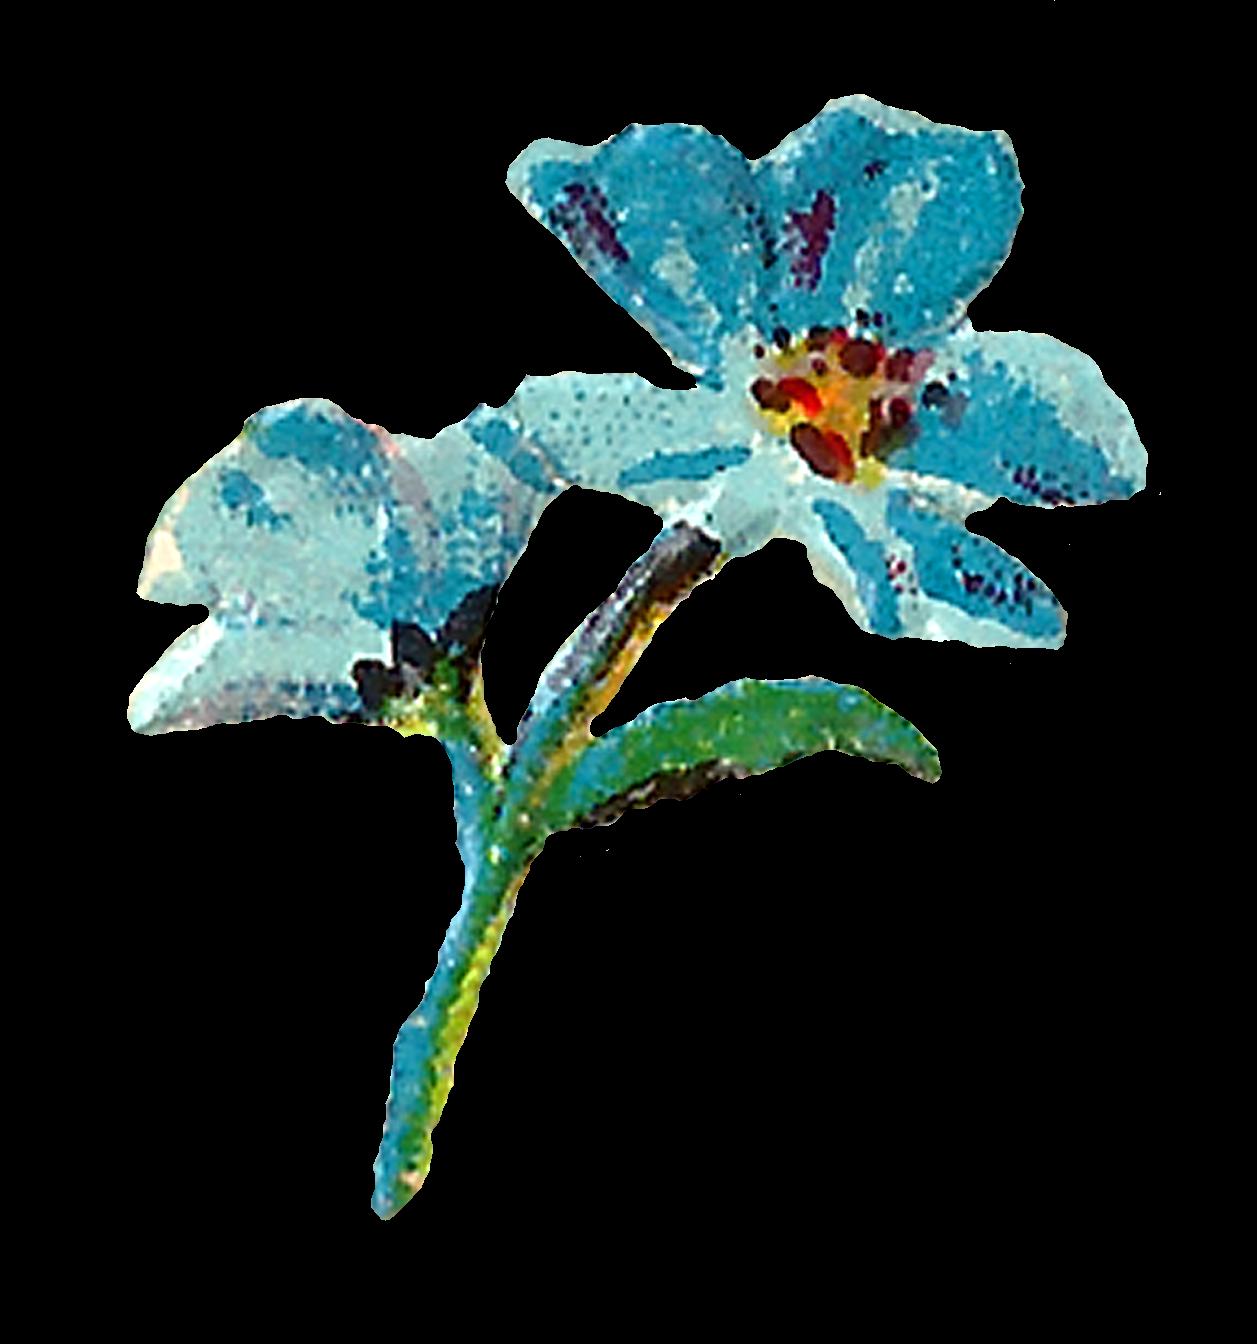 Teal watercolor flower clipart vector download Antique Images: Pastel Floral Clipart Digital Flowers Pink Blue ... vector download